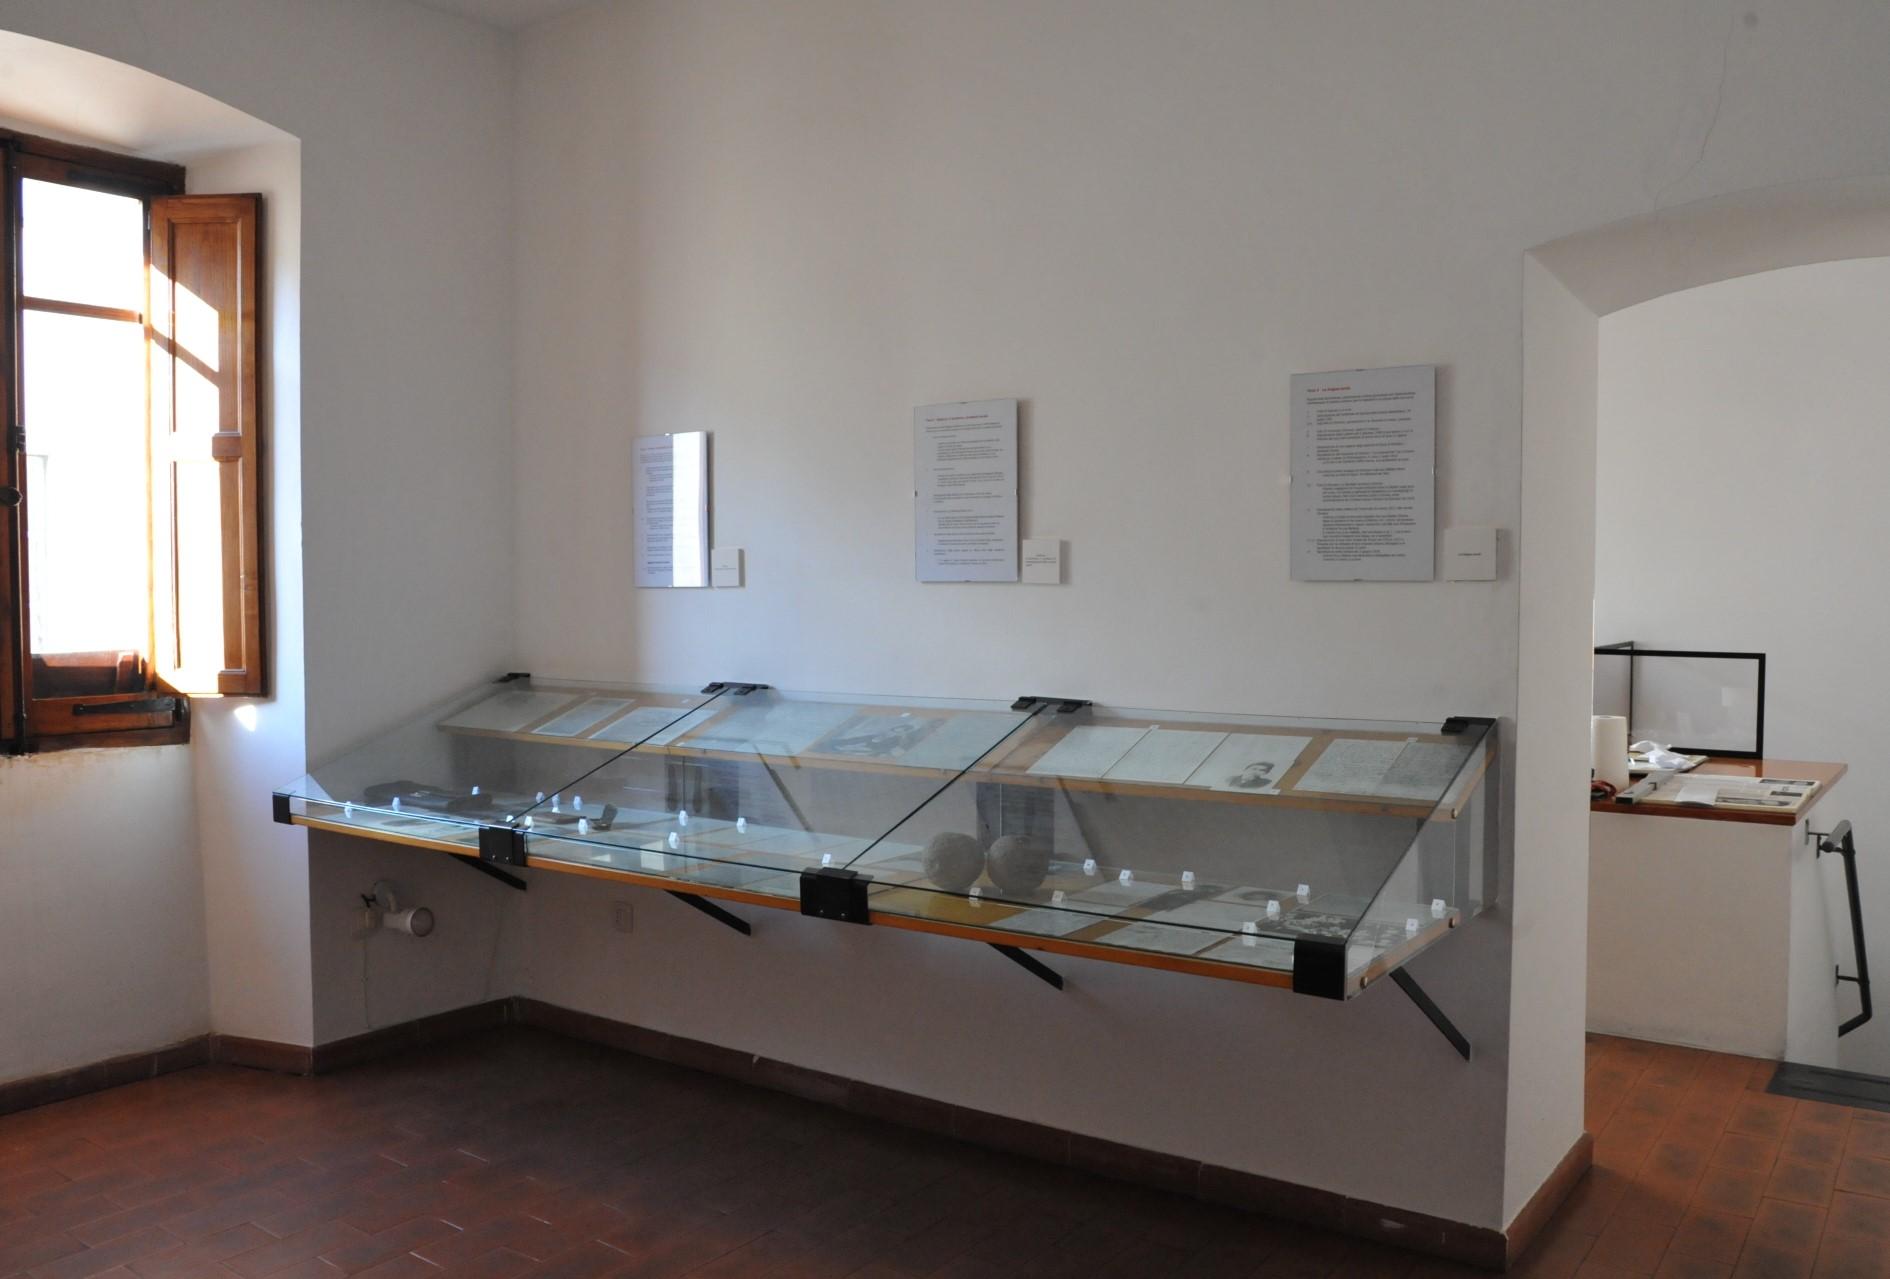 Museo.Homepage Casa Museo Di Antonio Gramsci